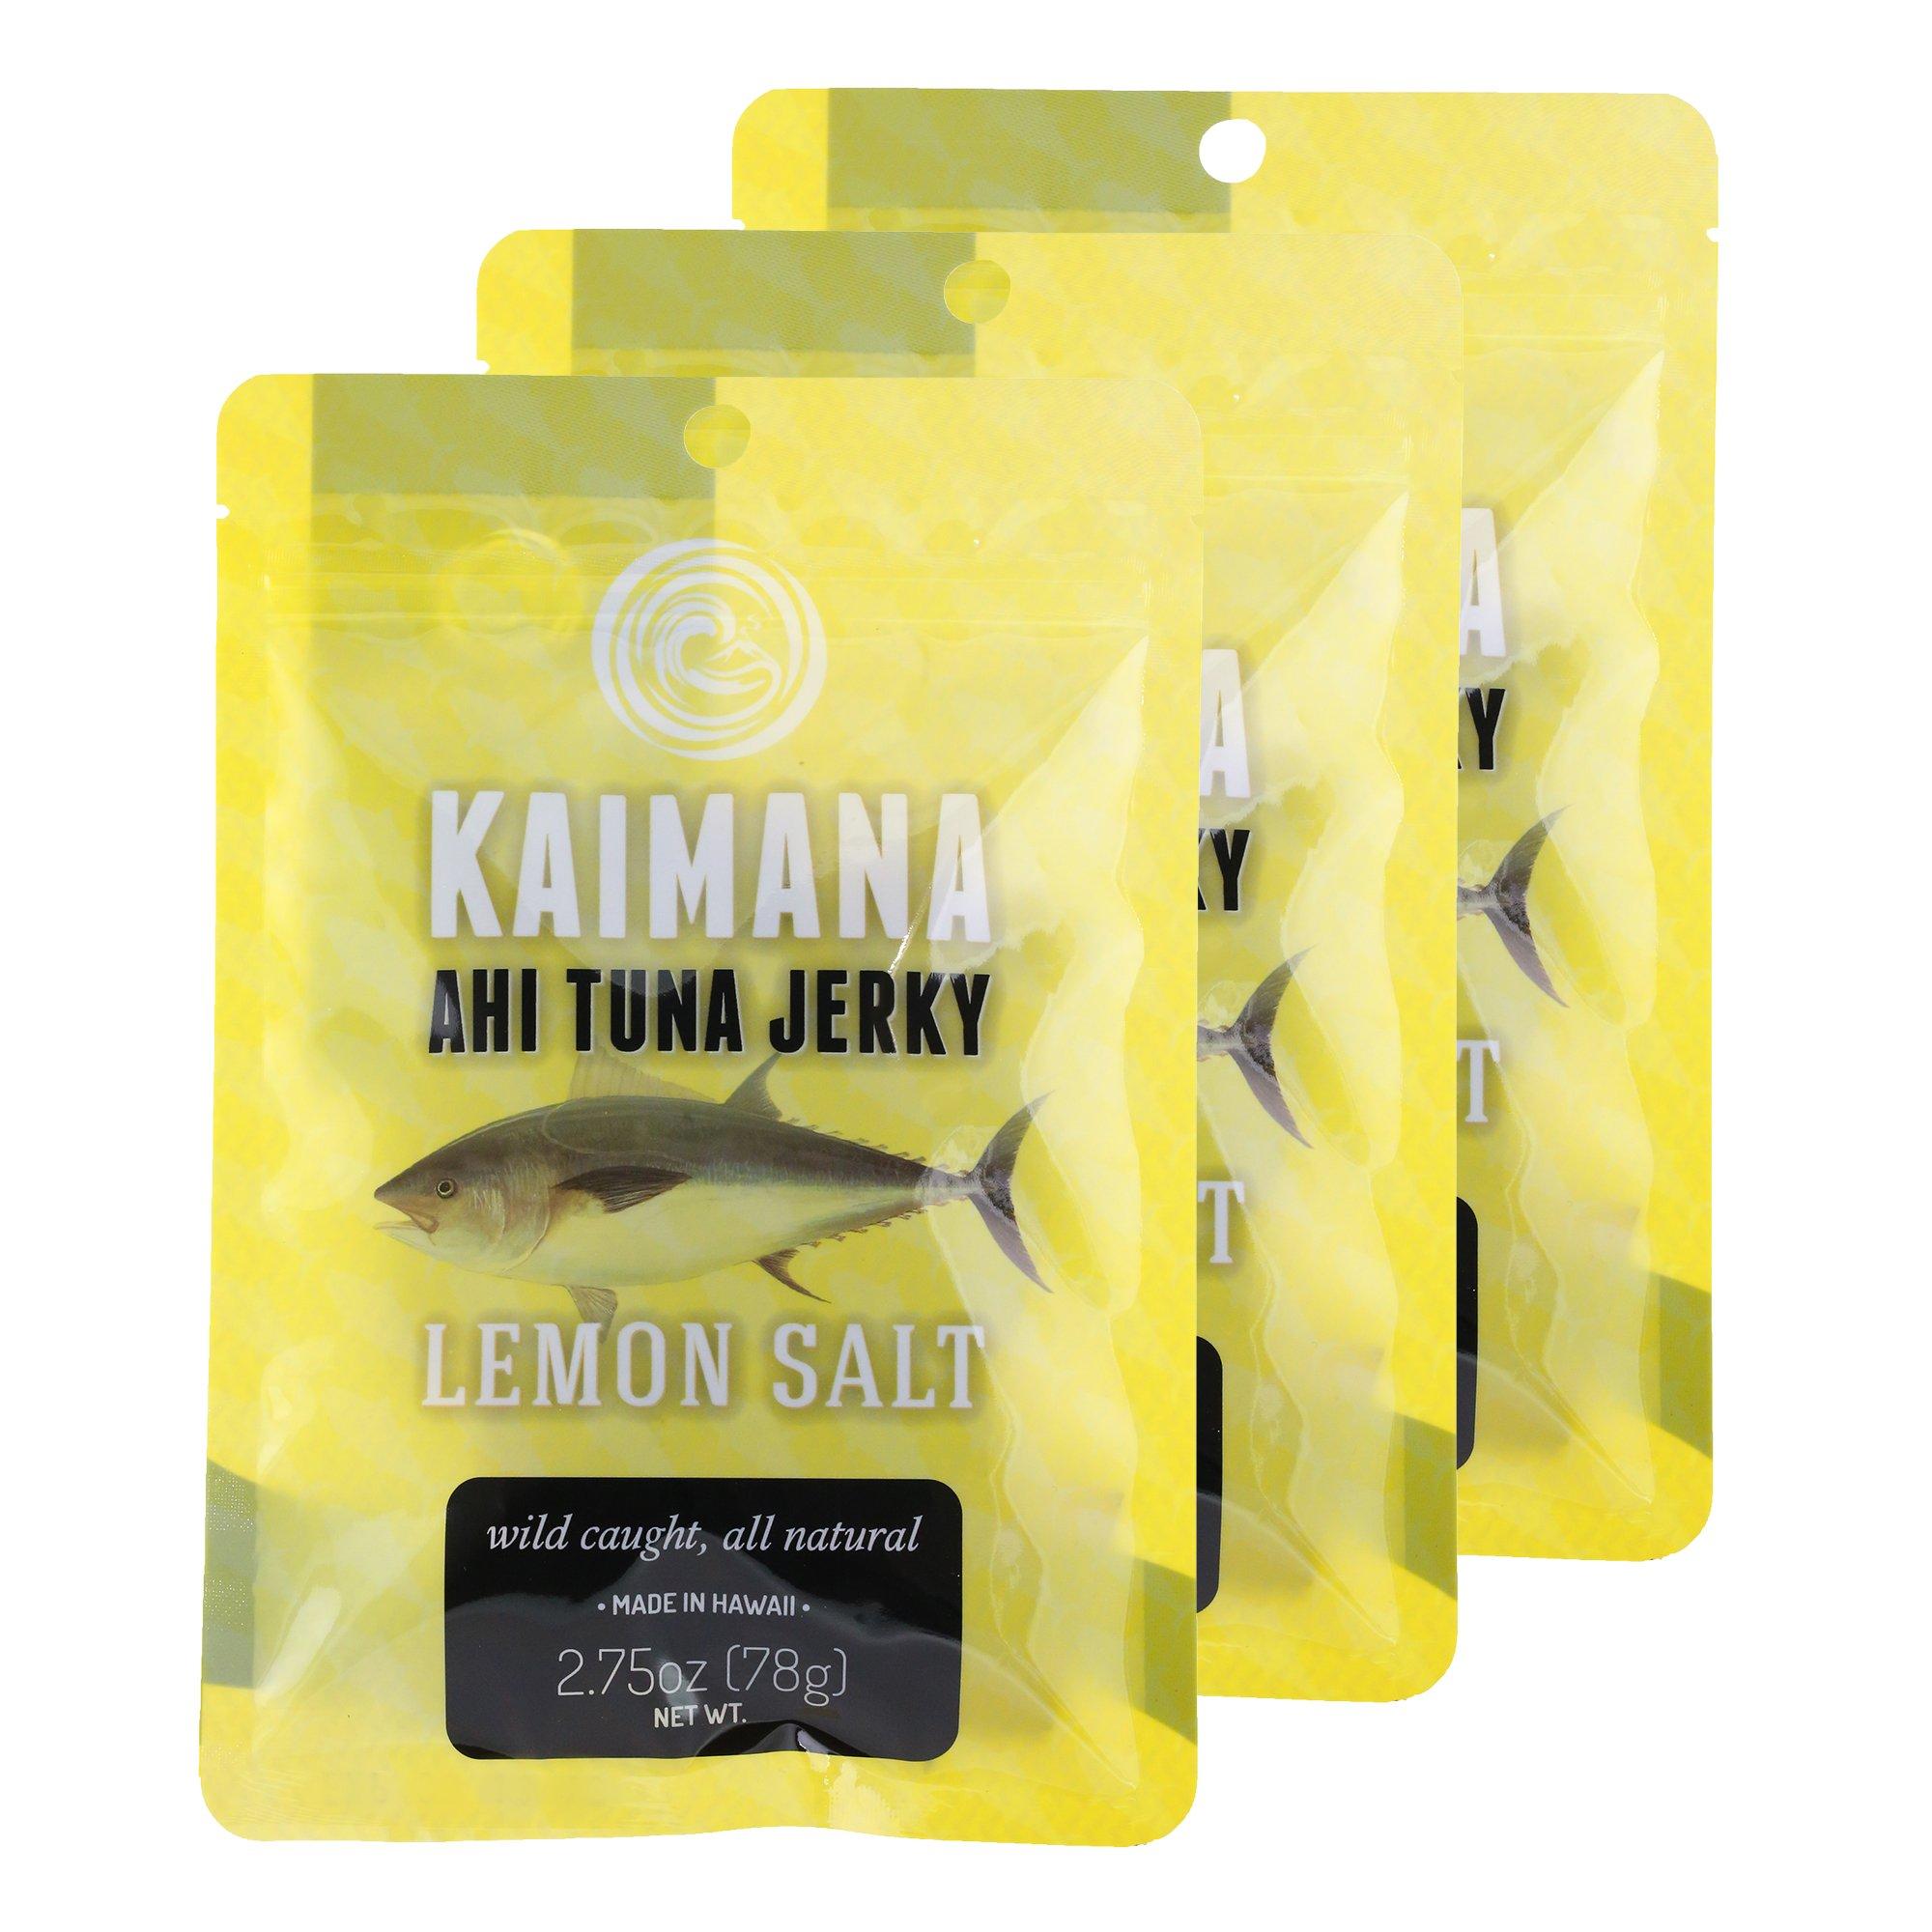 Kaimana Jerky - Lemon Salt Ahi Tuna Jerky 3 Pack - Premium Fish Jerky Made in the USA. All Natural and Wild Caught.